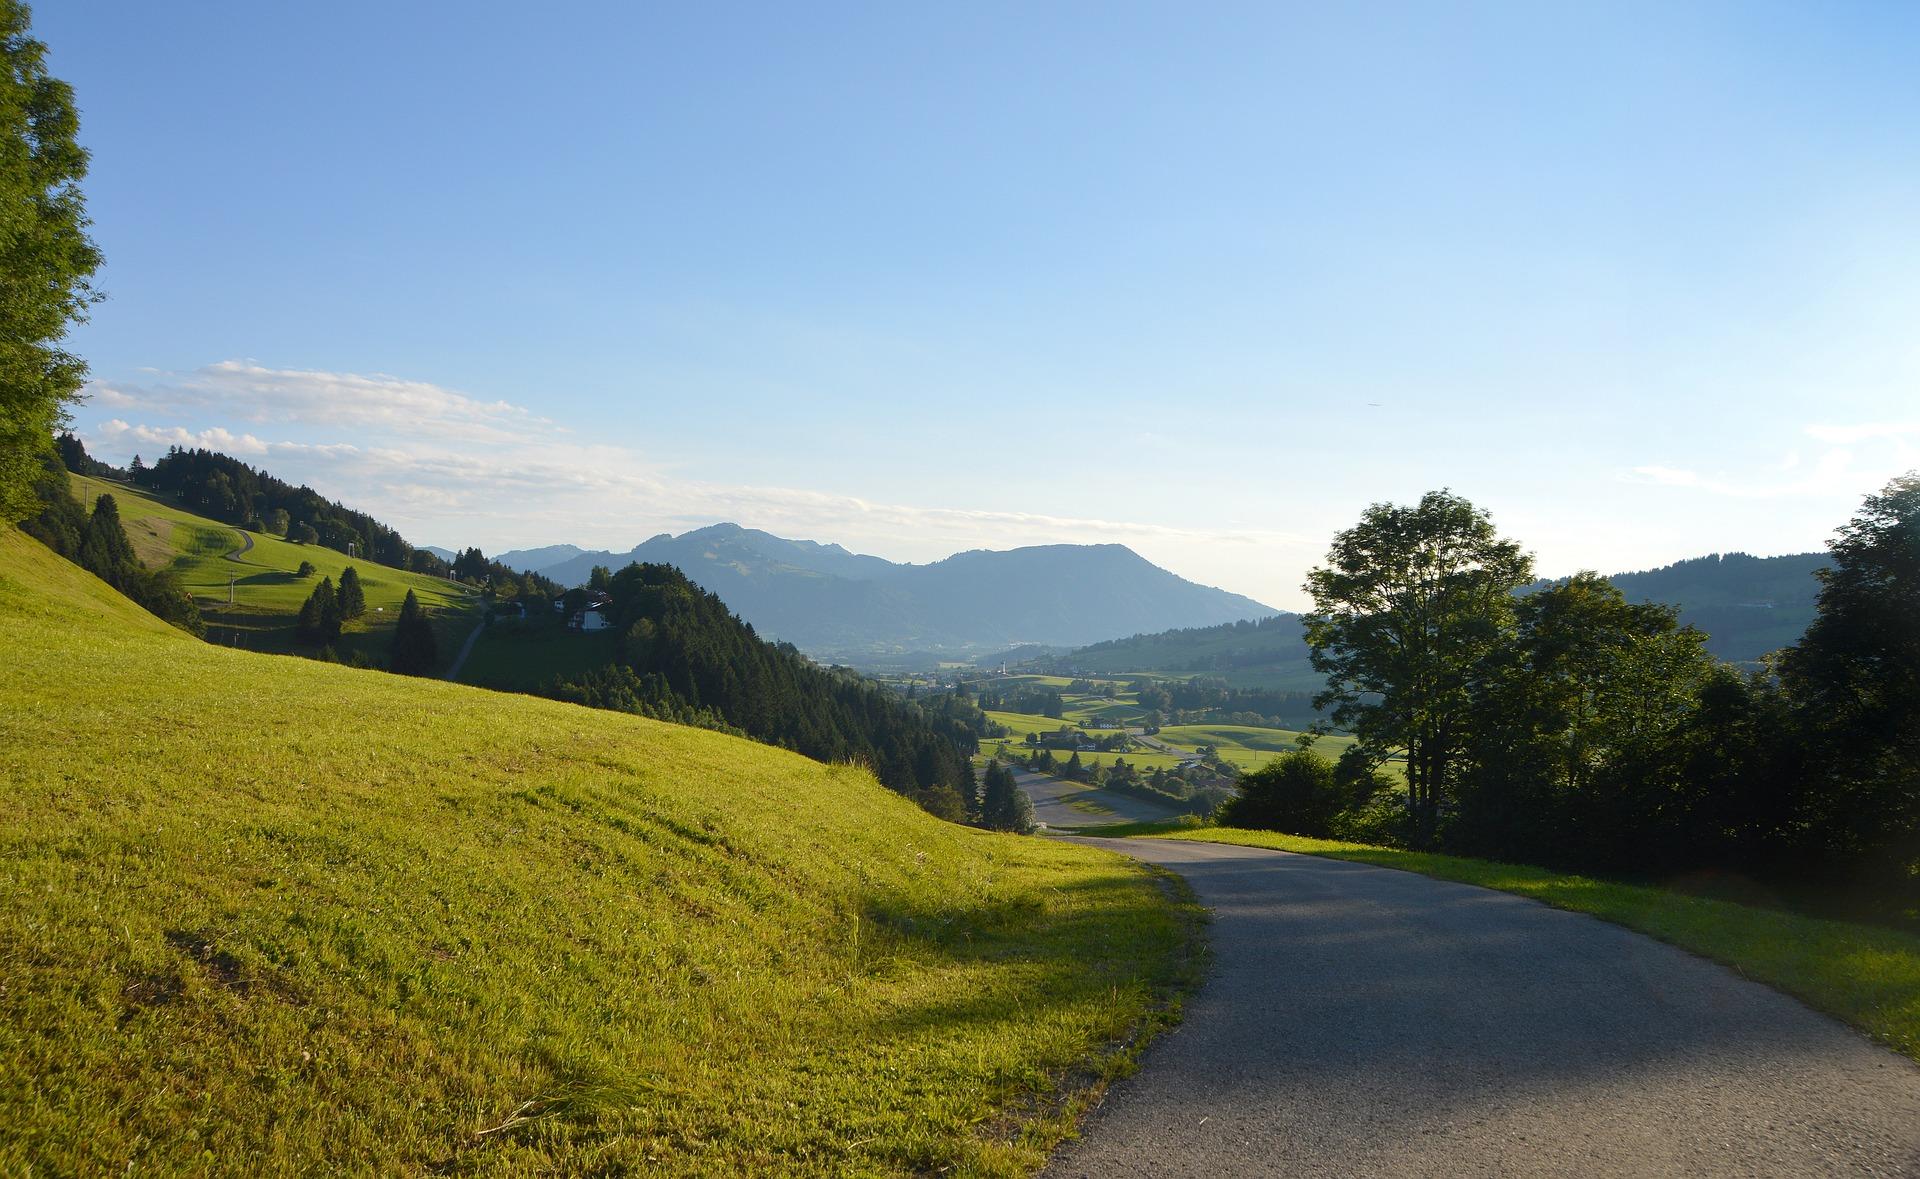 Seenlandschaft im Allgäu